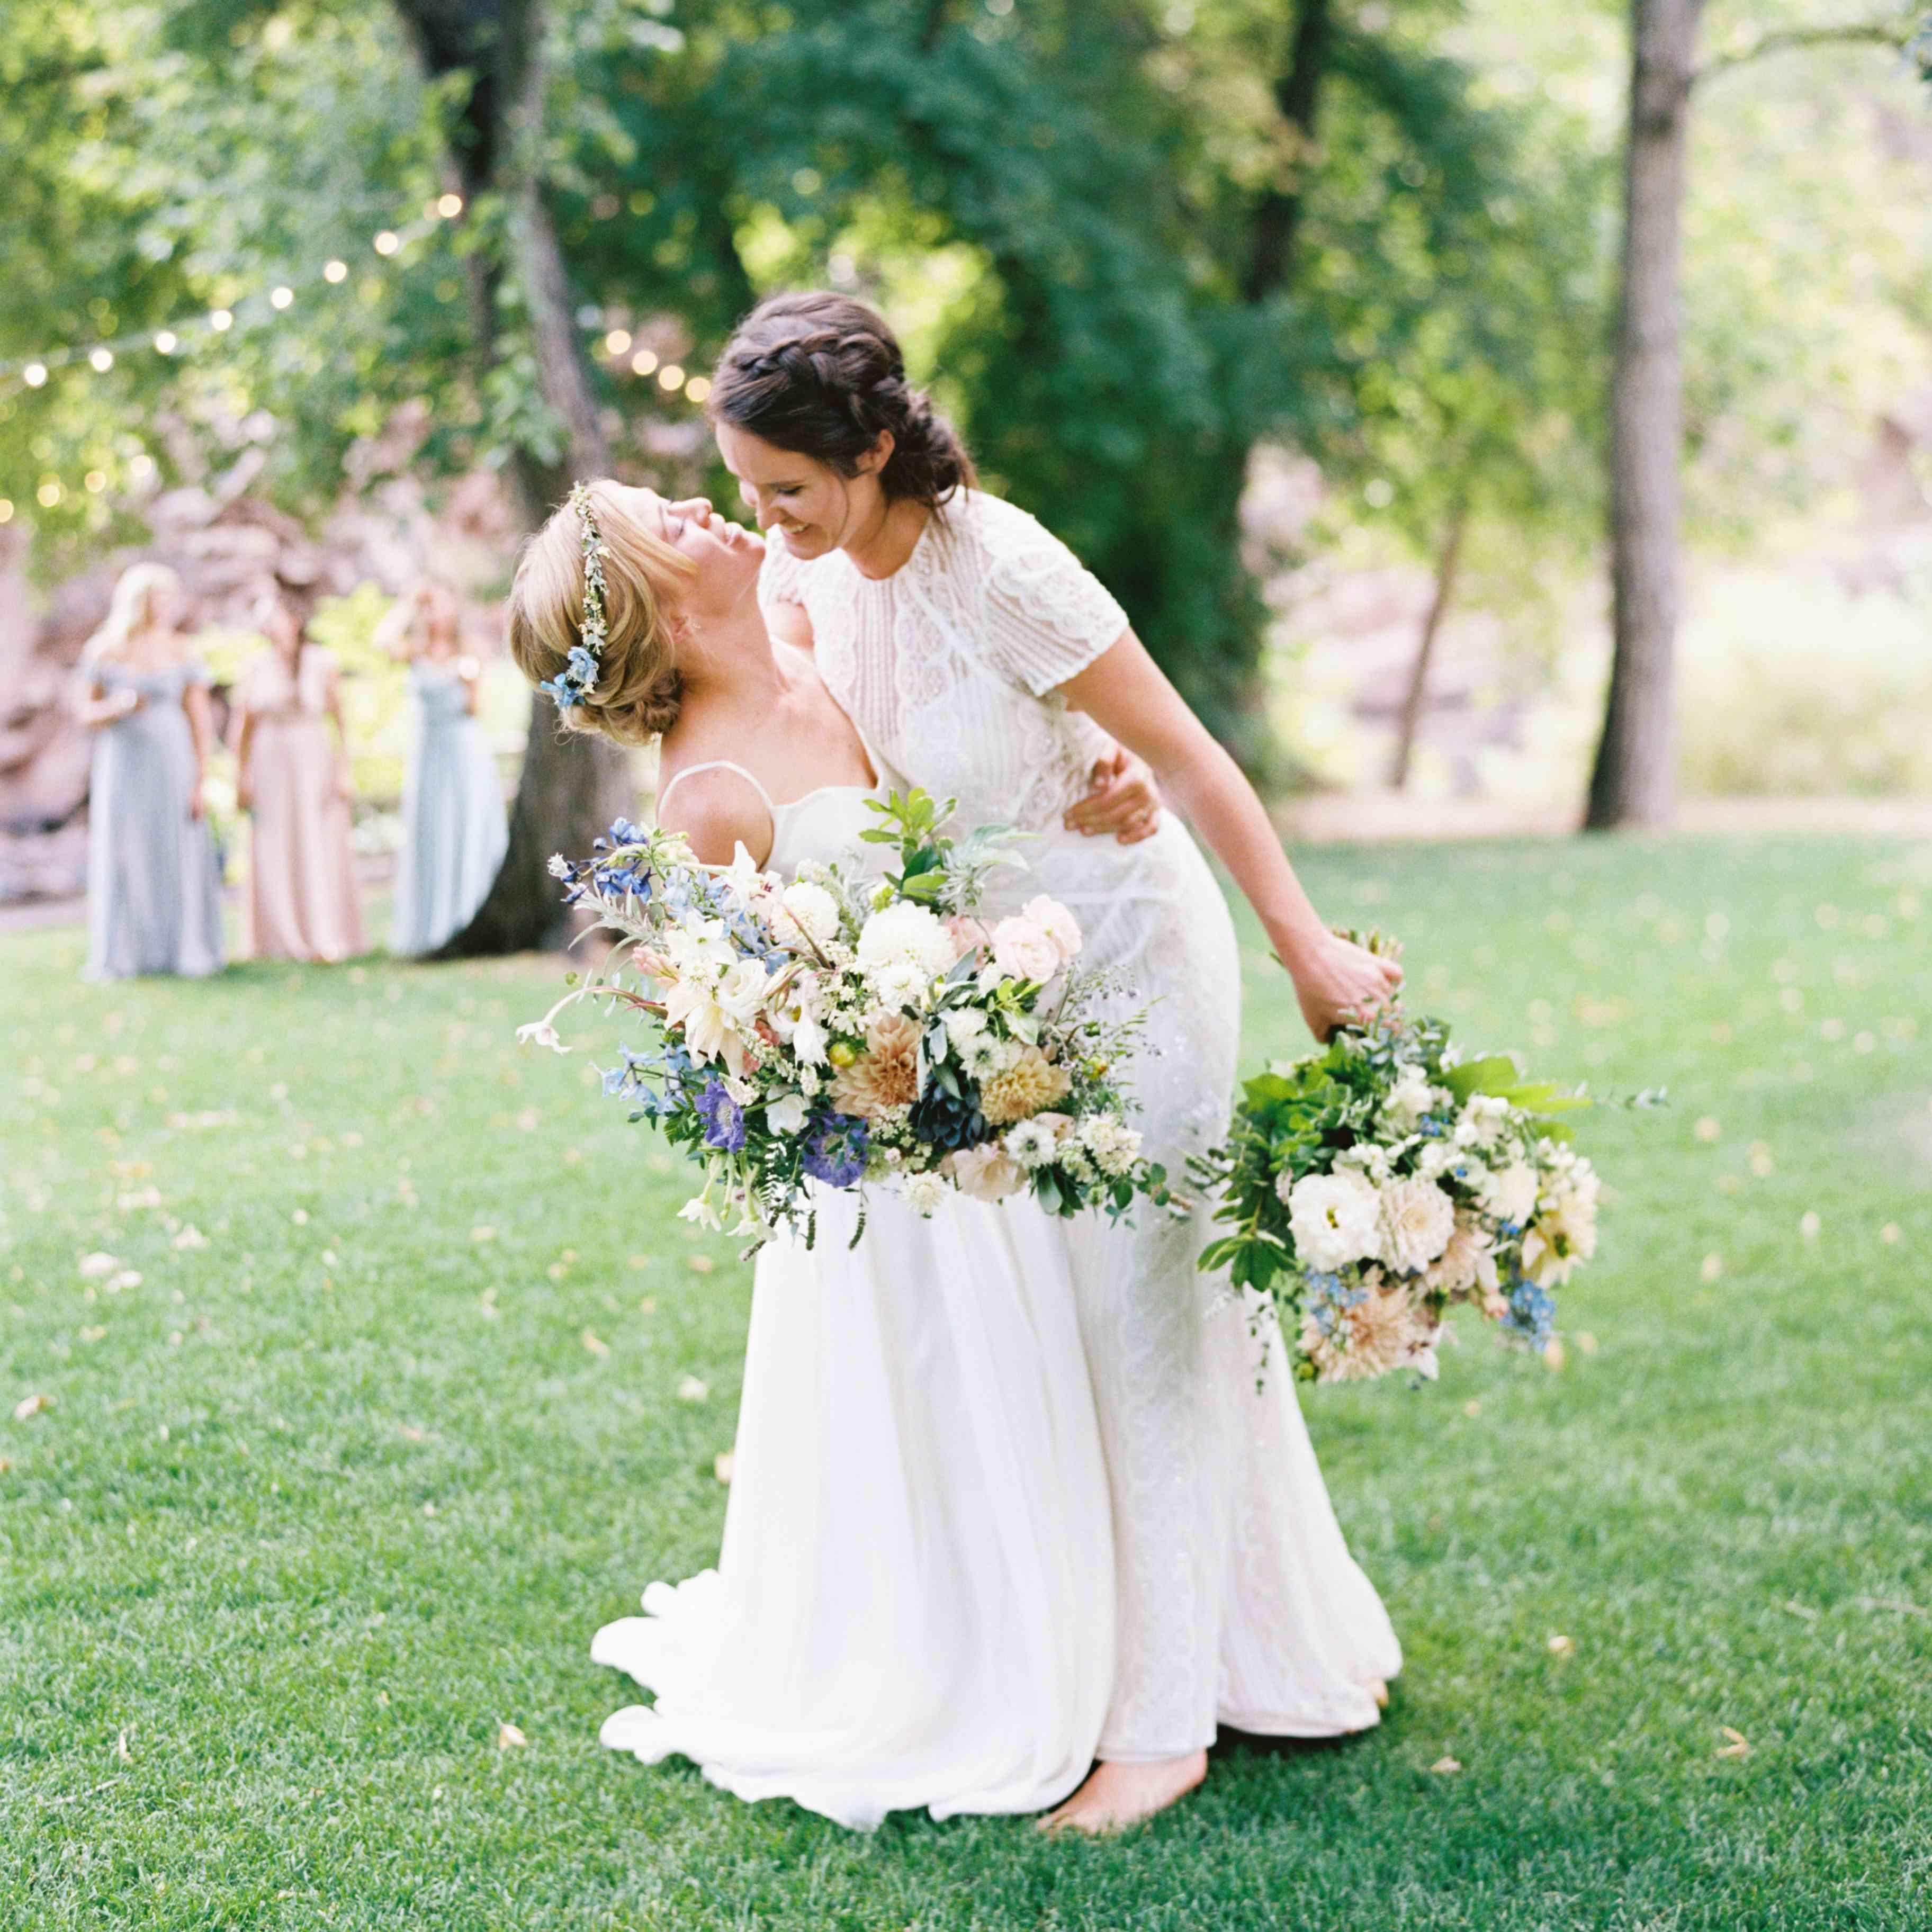 brides in BHLDN dresses